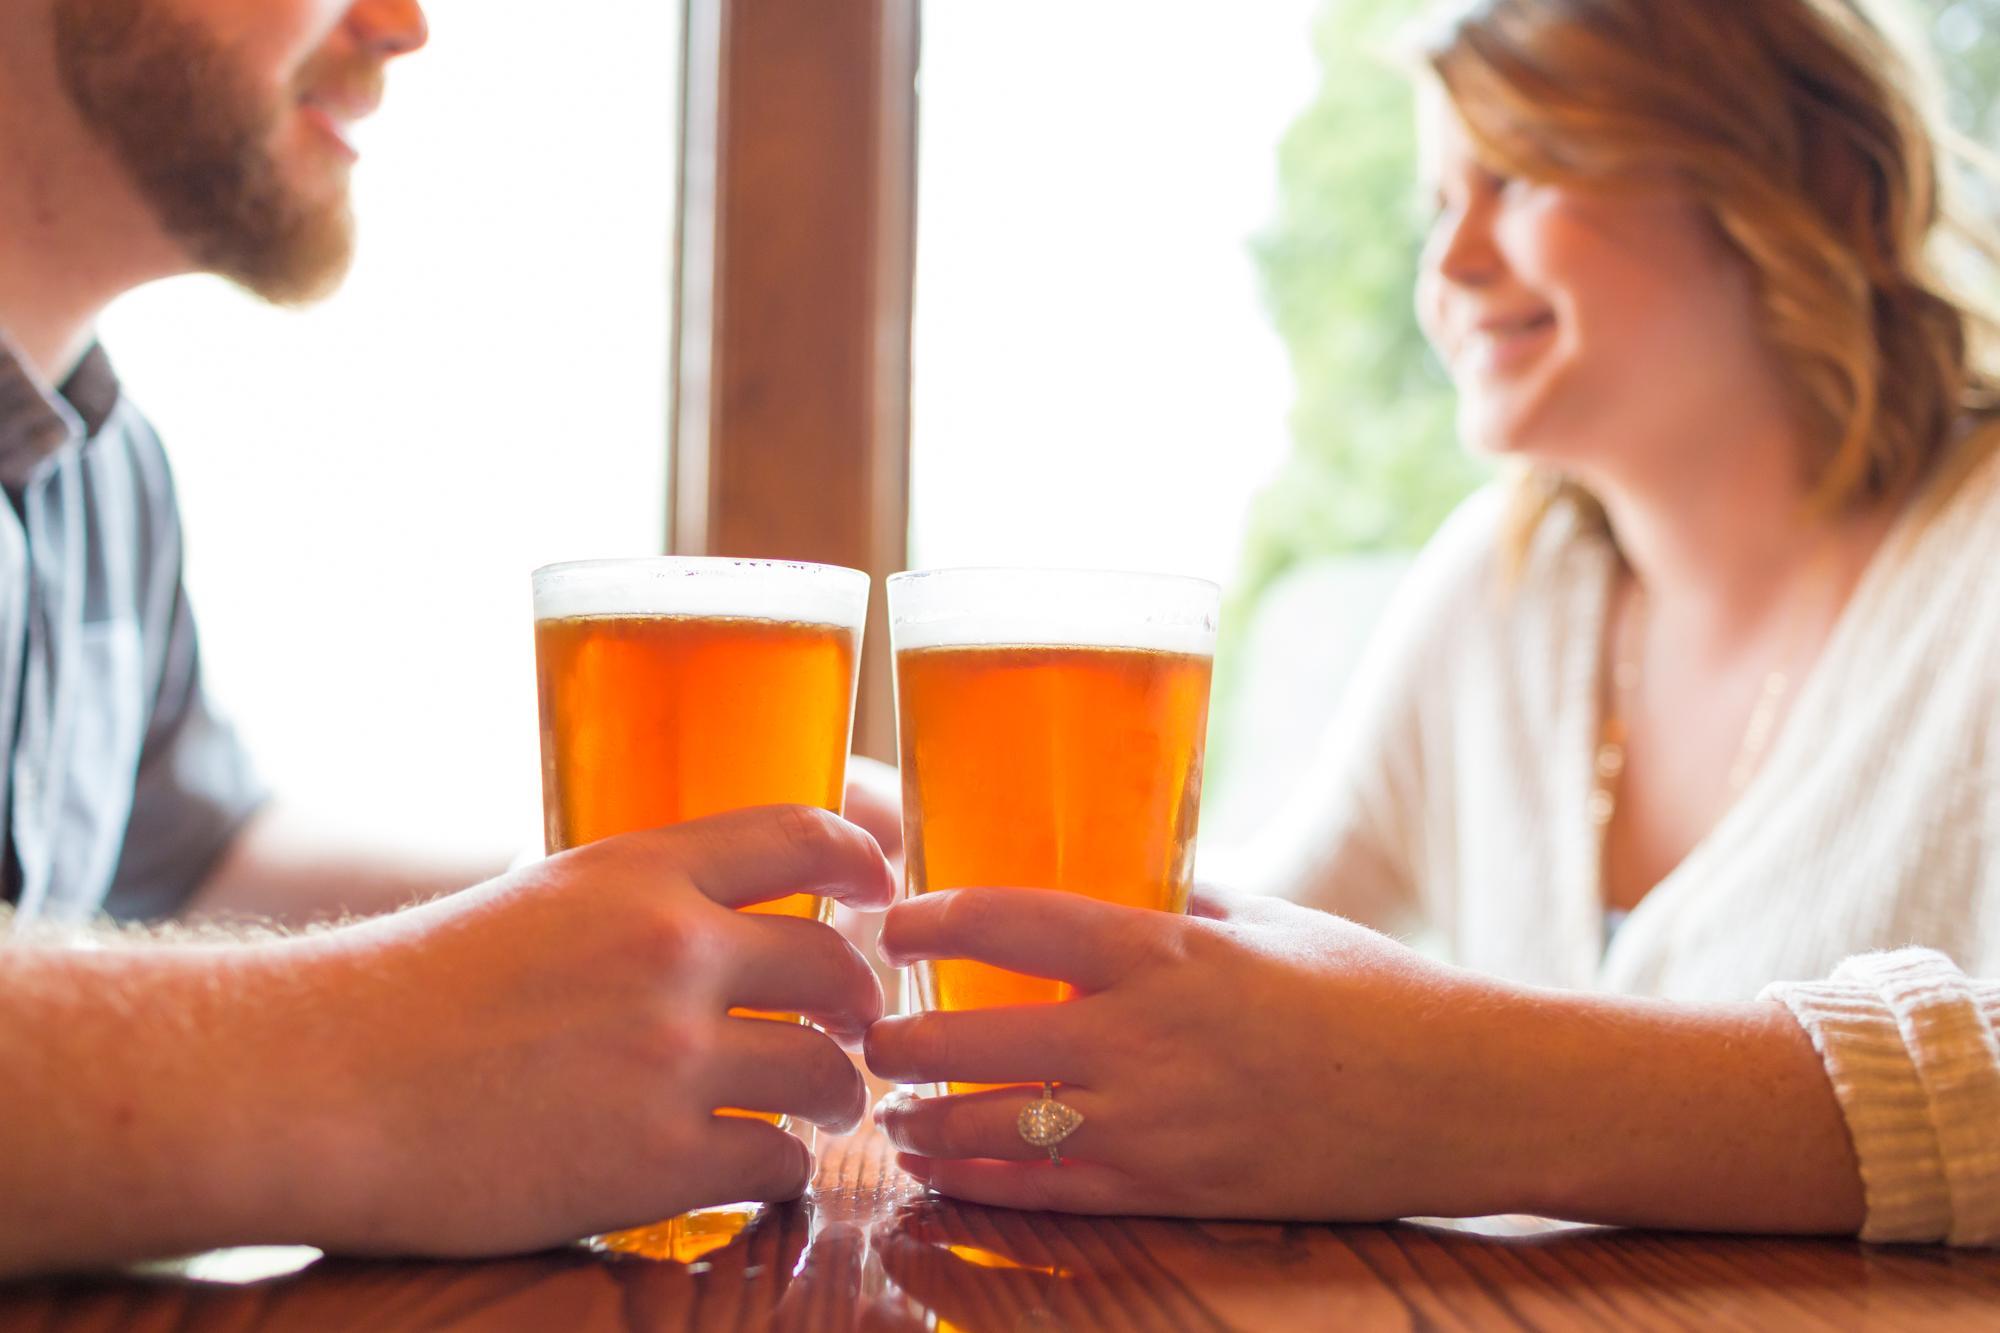 San Diego Engagement Photographers Blessed Wedding Photography 4.jpg